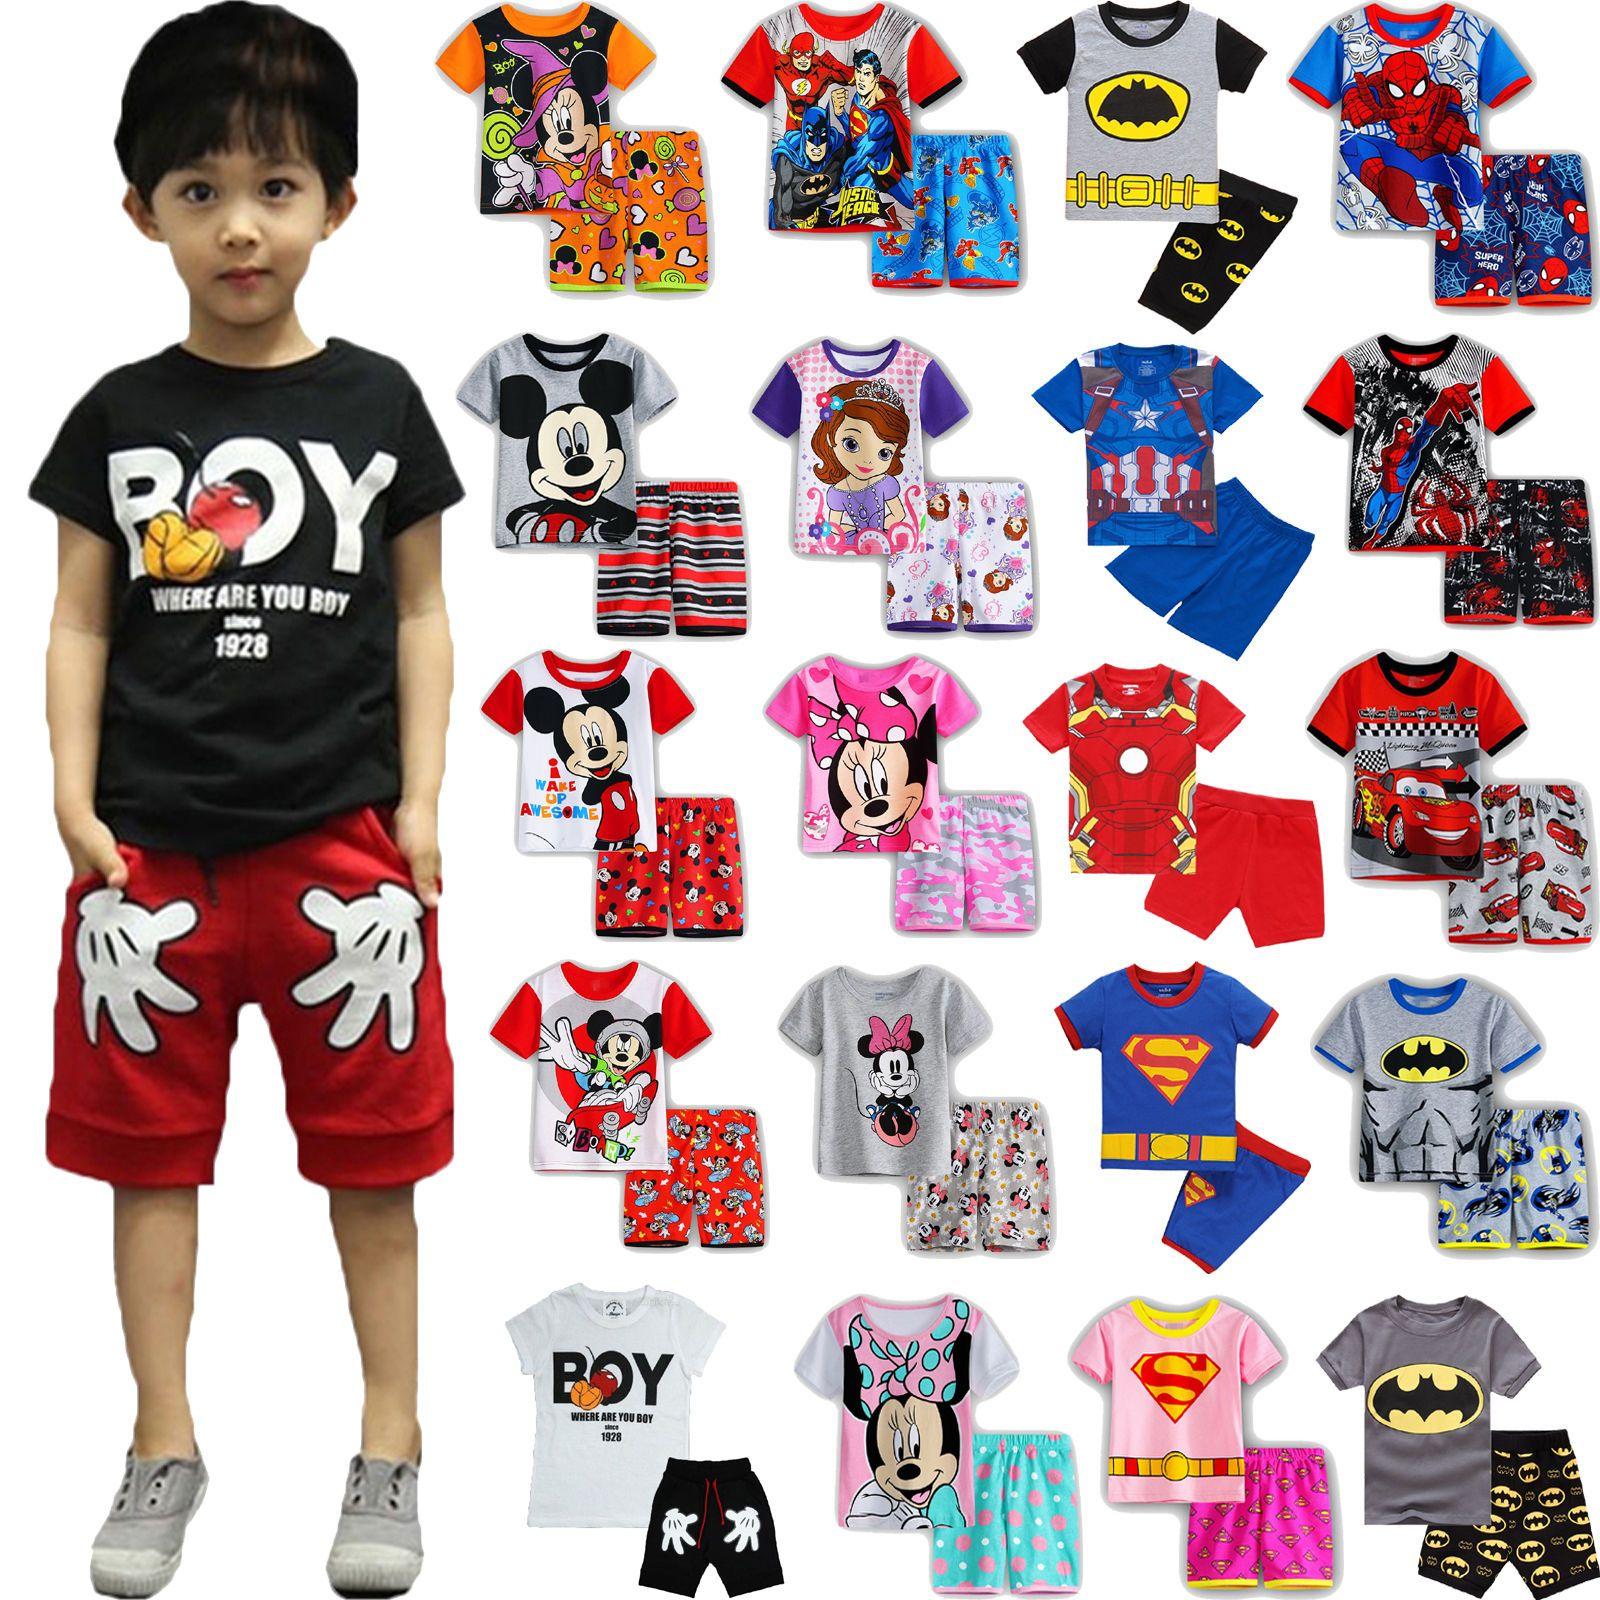 Short Pant Set Kids Boys Cartoon Sleepwear Pj/'s Pyjamas Summer Outfits T-shirt